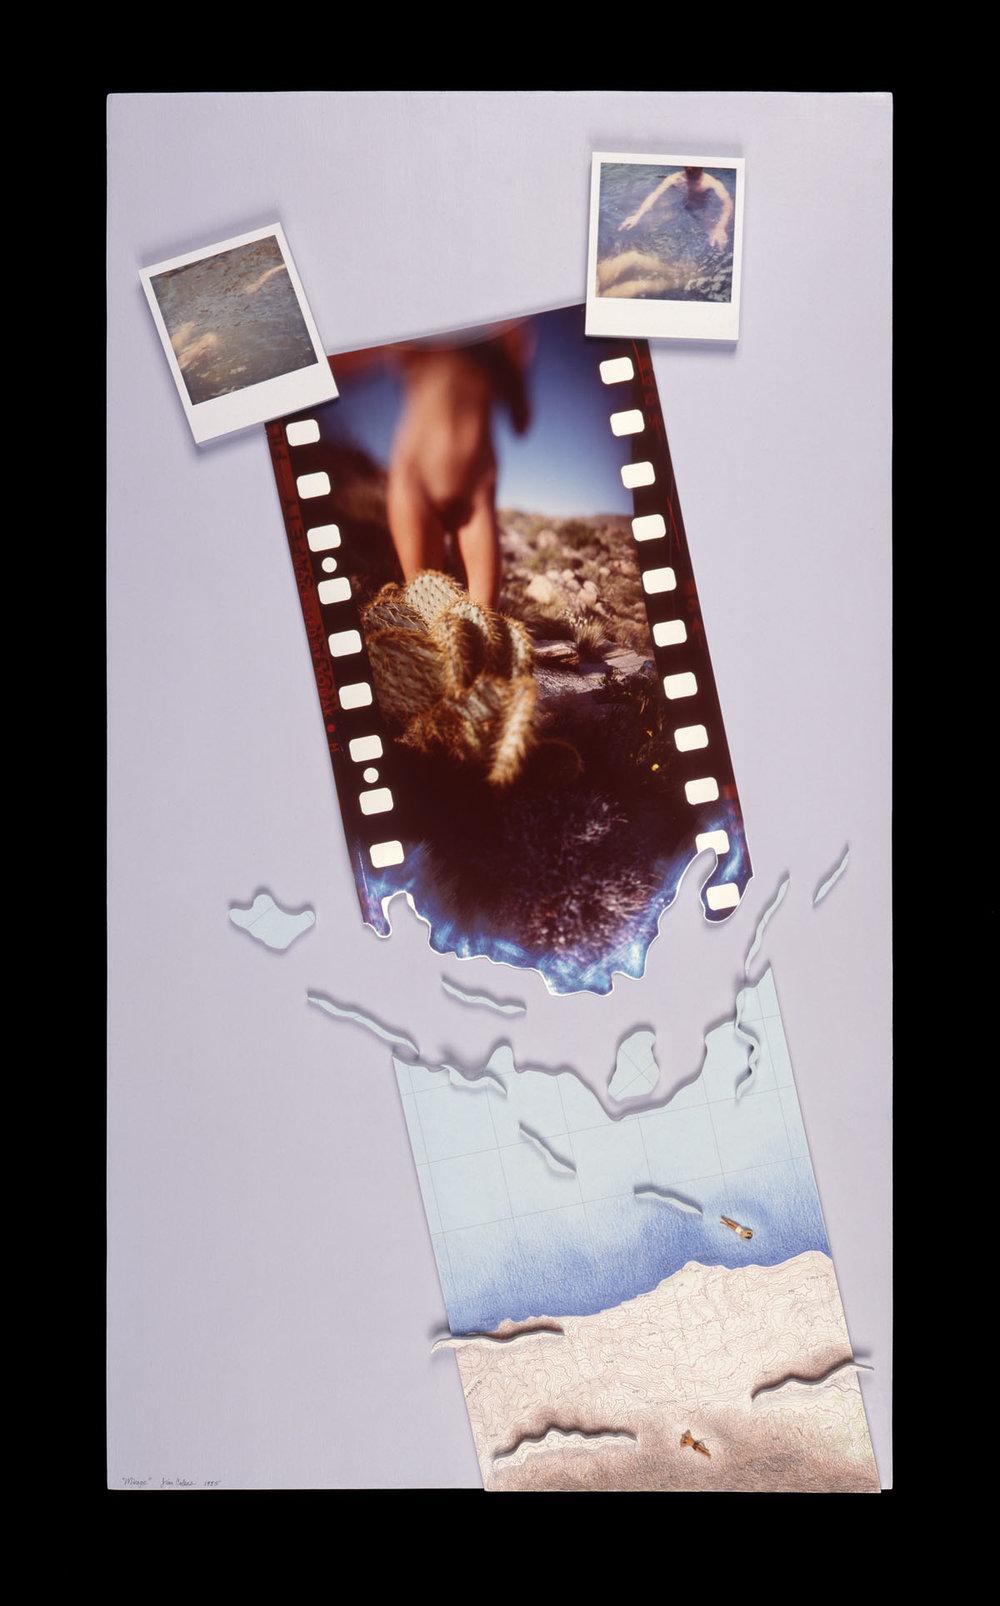 "Mirage   28""H x 20""W x 2""D, Cibachrome print, Polaroid SX-70 prints, topographic map, scale model figures, colored pencil, acrylic paint"